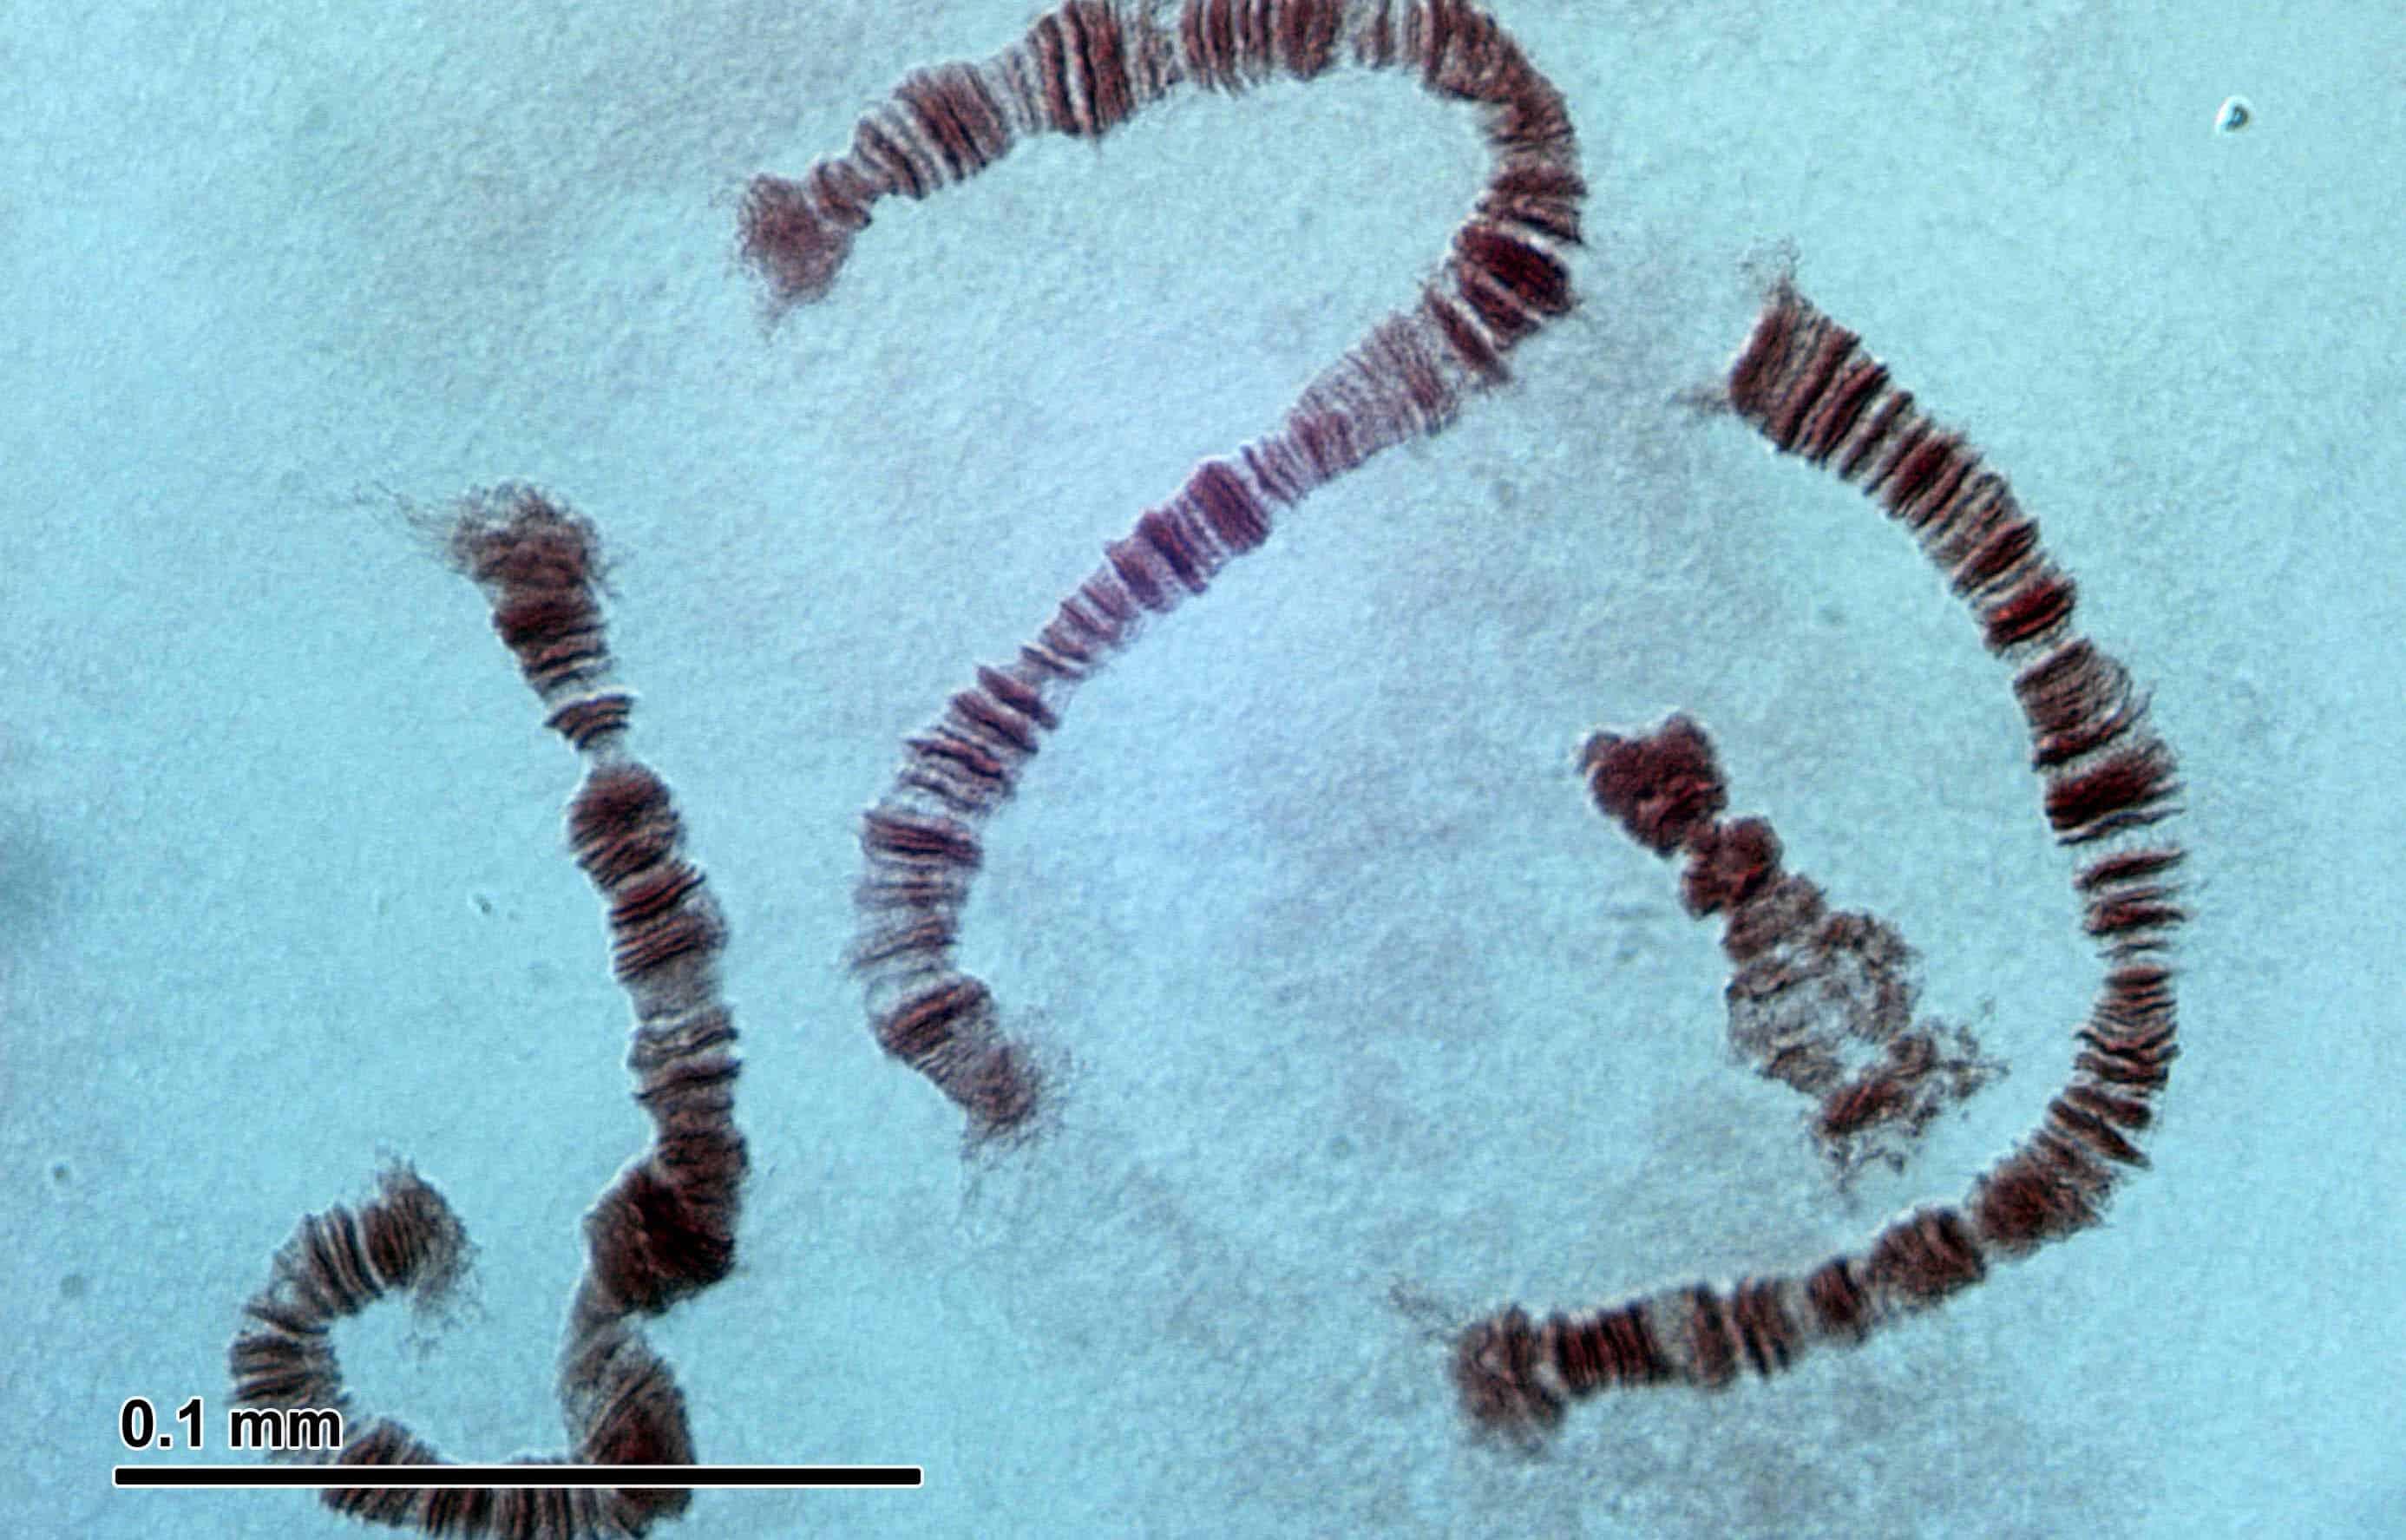 Preparation of Drosophila Polytene Chromosome Squashes for Antibody Labeling